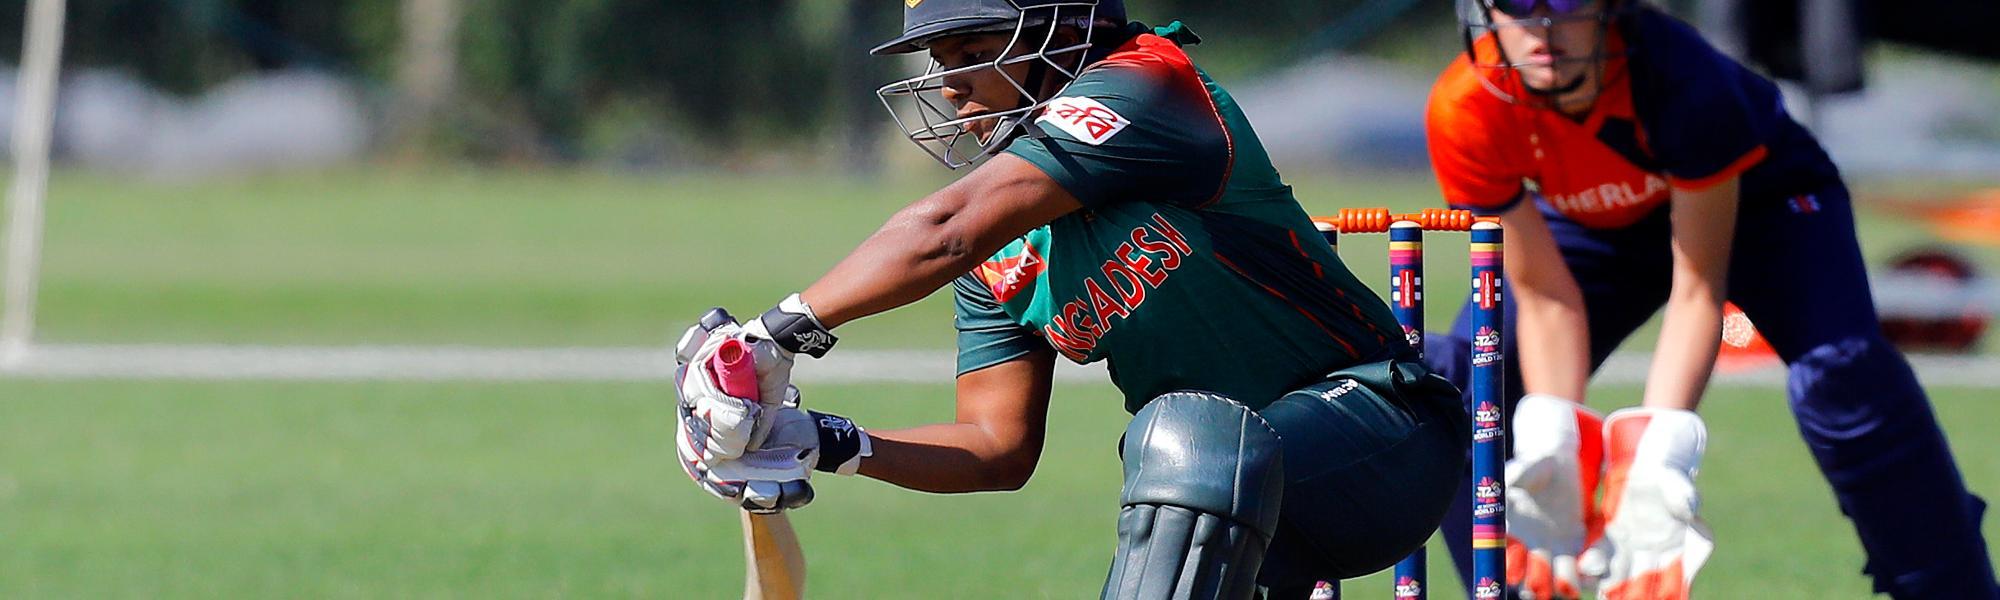 Match 7: Bangladesh Batsman Shamima Sultana plays a shot, Netherlands Women v Bangladesh Women, Group B, ICC Women's World Twenty20 Qualifier at Utrecht, 8th July 2018.